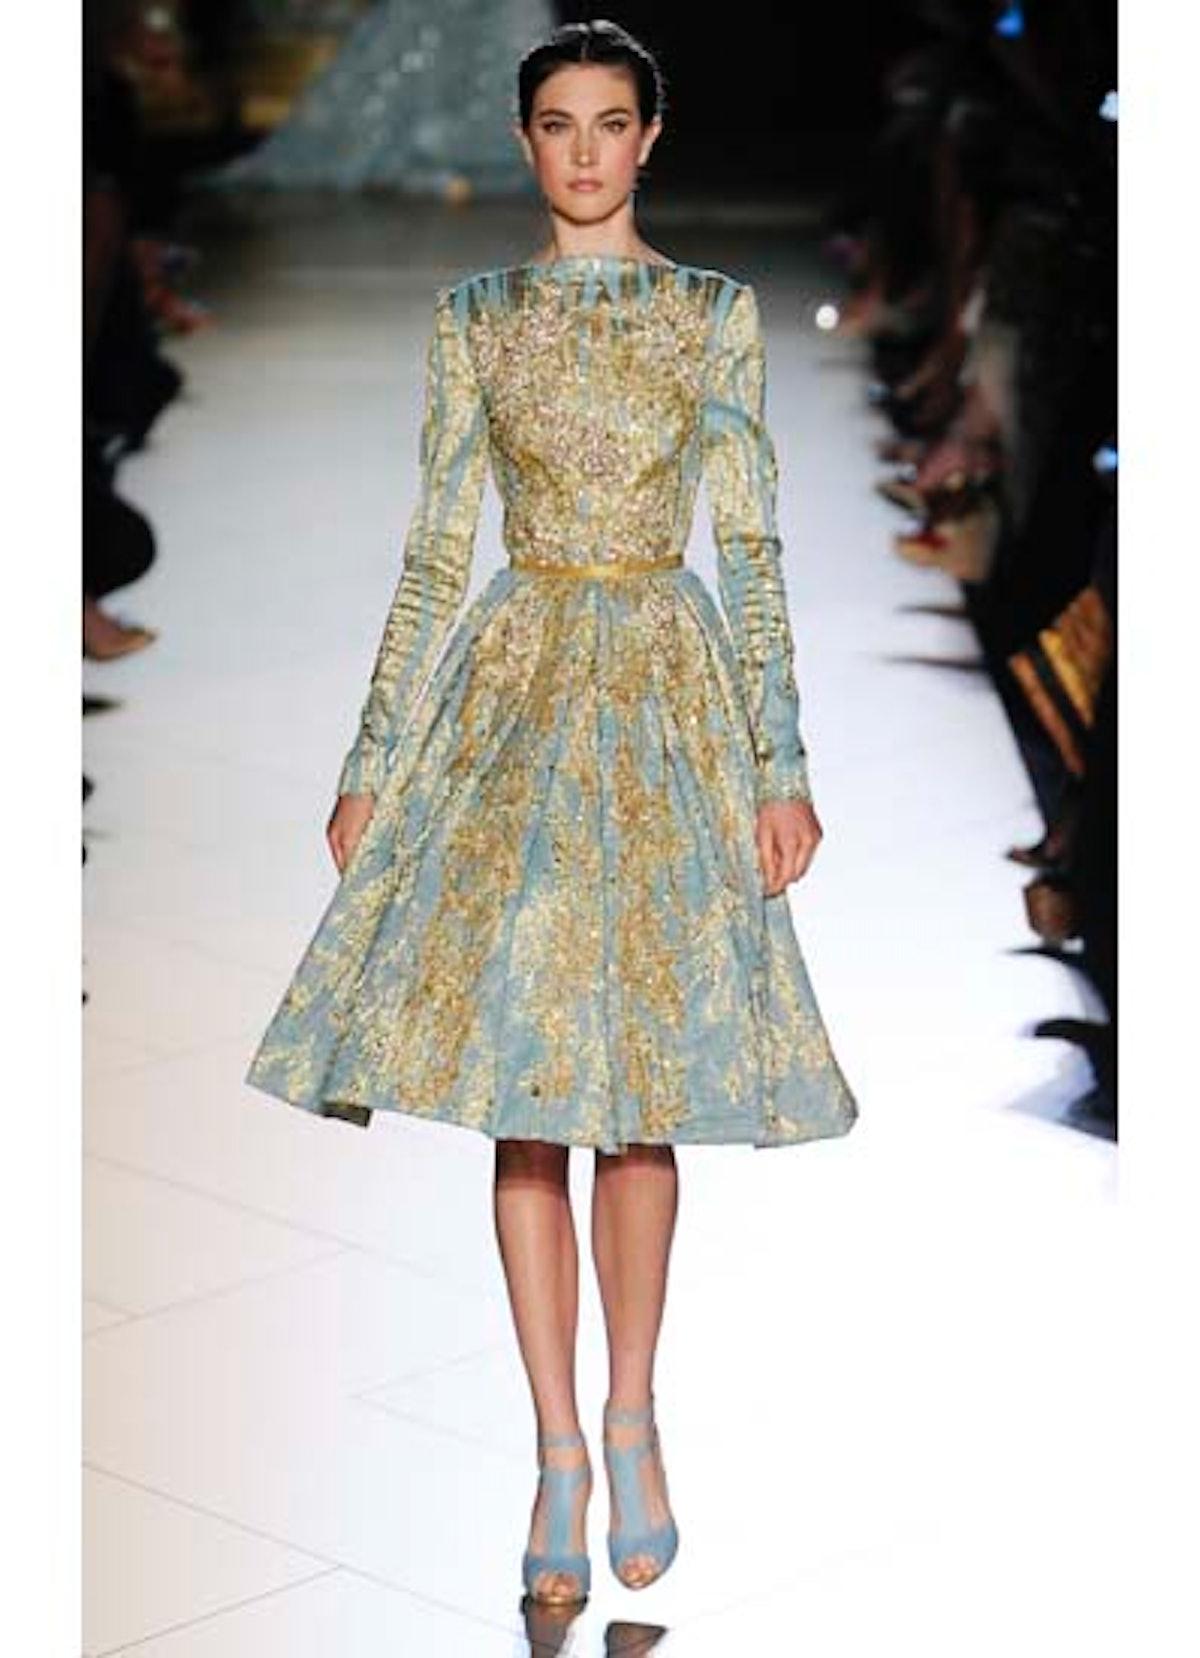 fass-elie-saab-couture-2012-runway-22-v.jpg